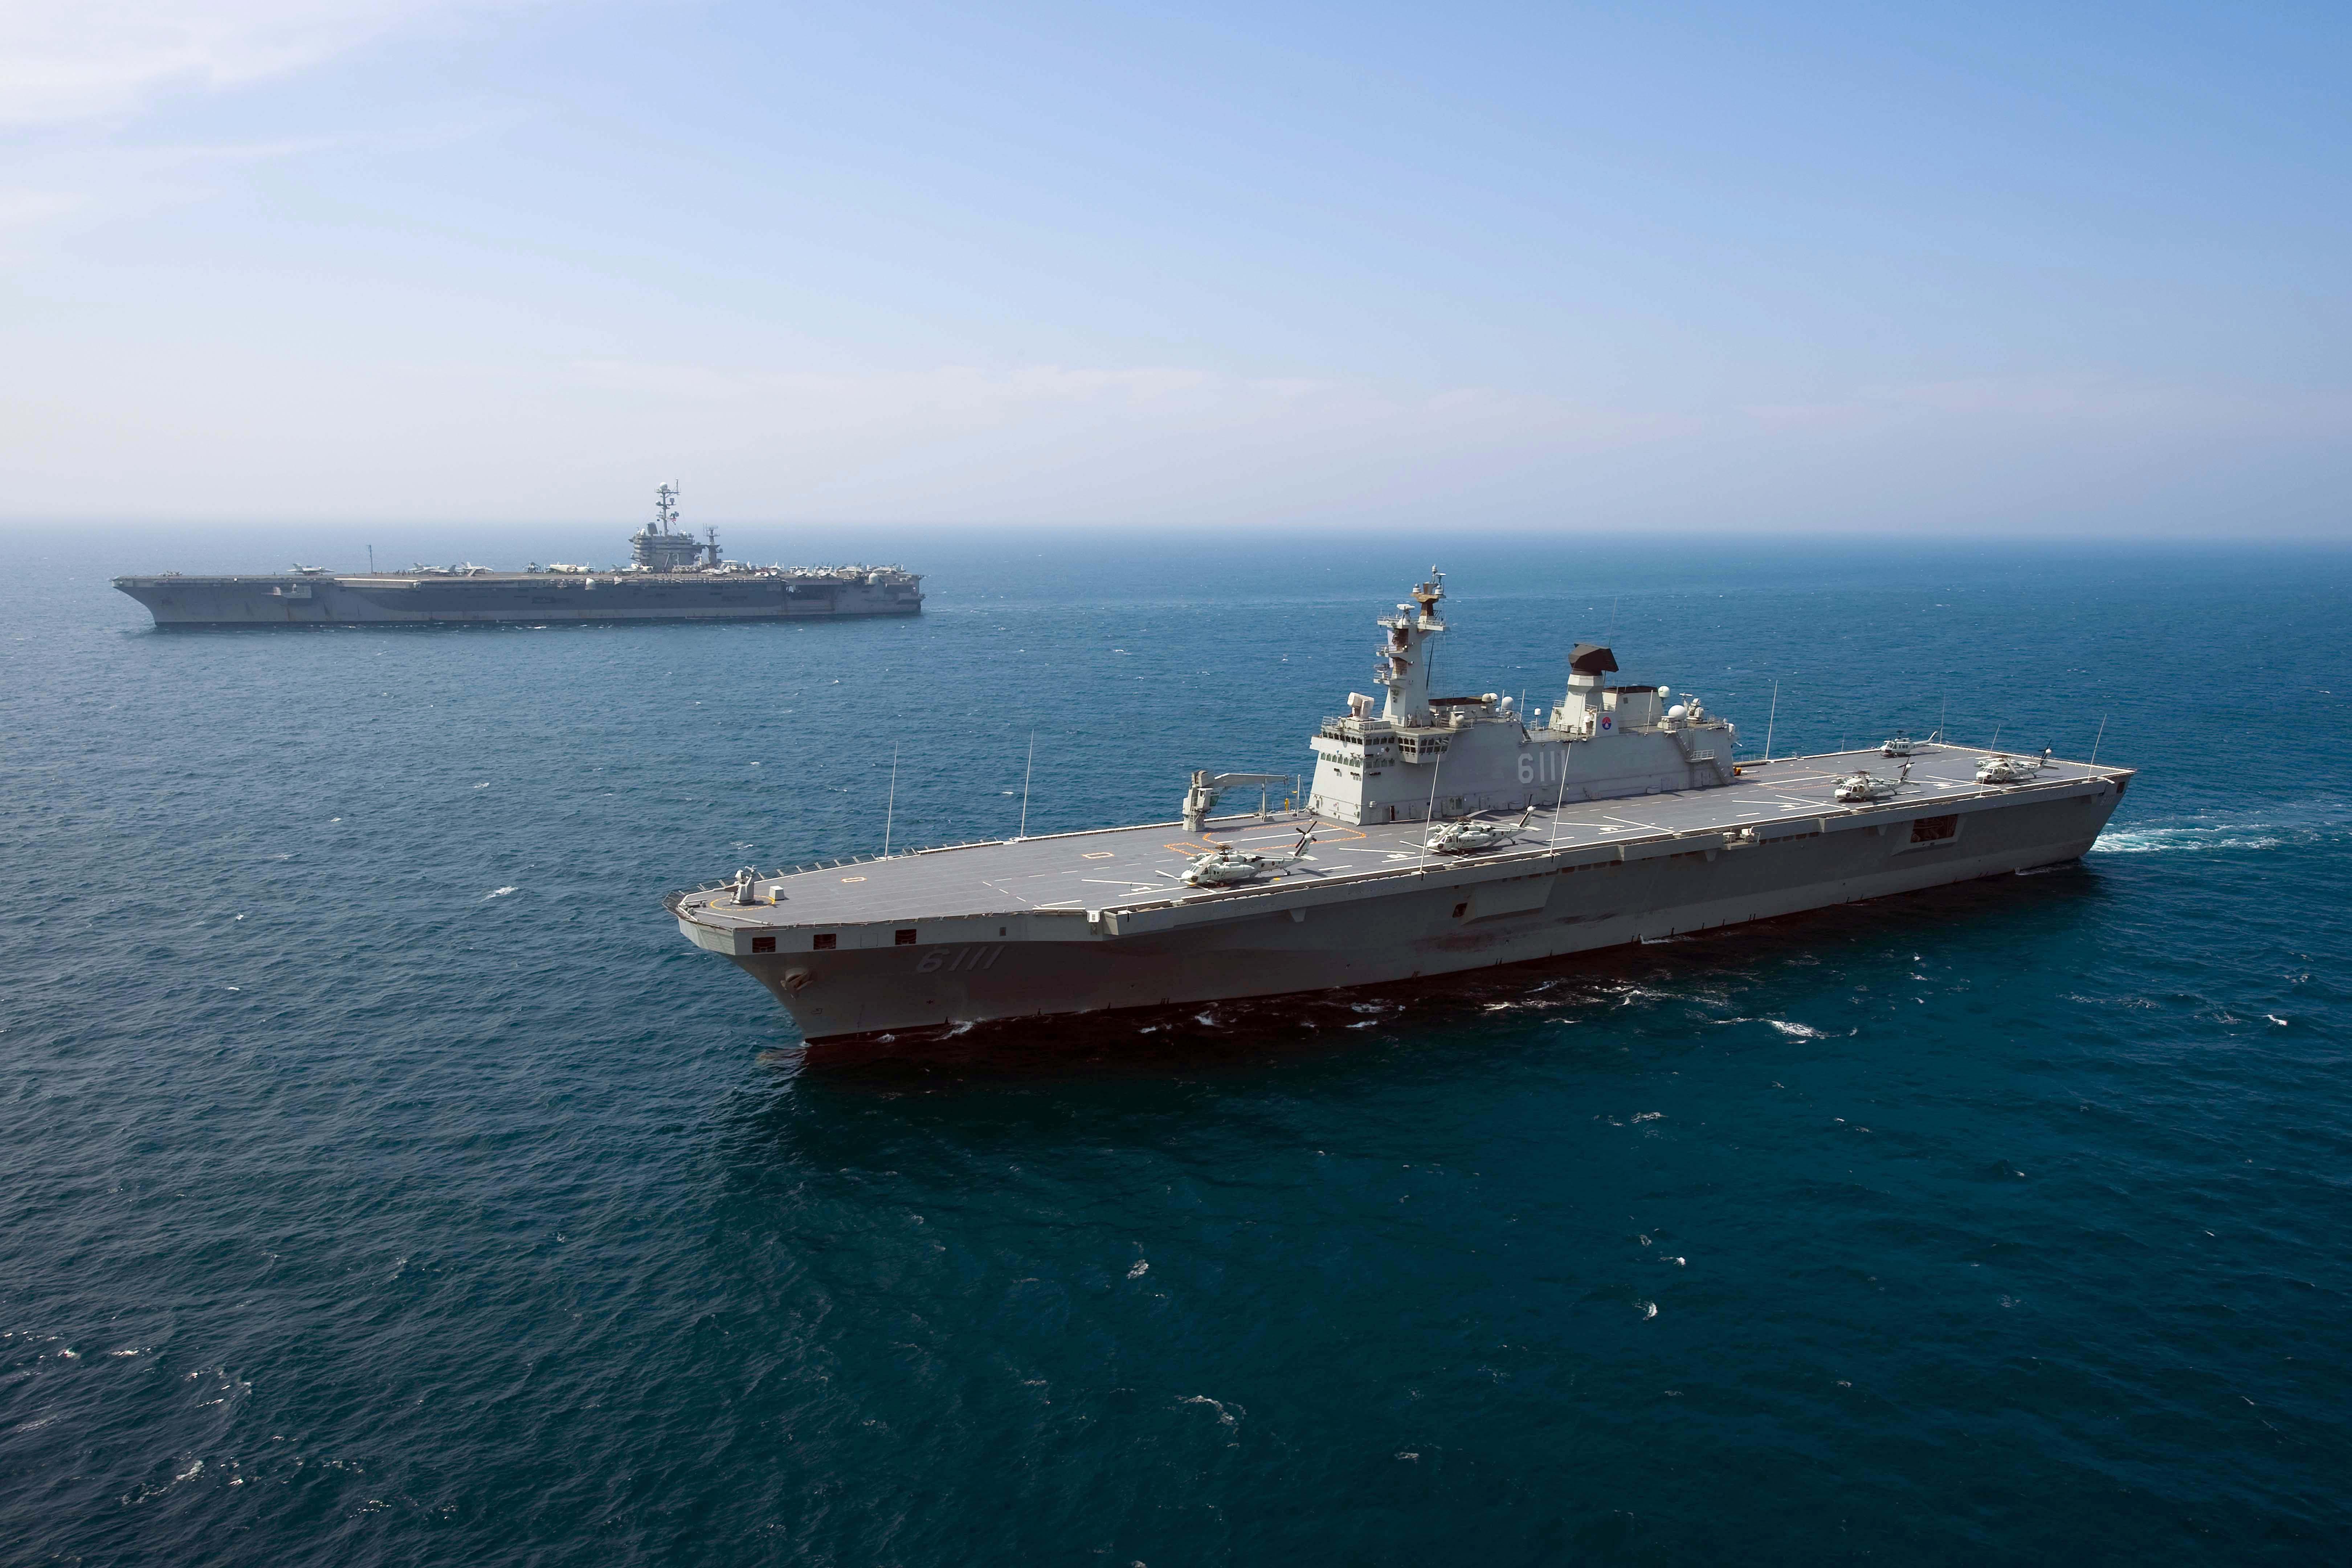 Aircraft carrier uss george washington cvn 73 transit the sea of